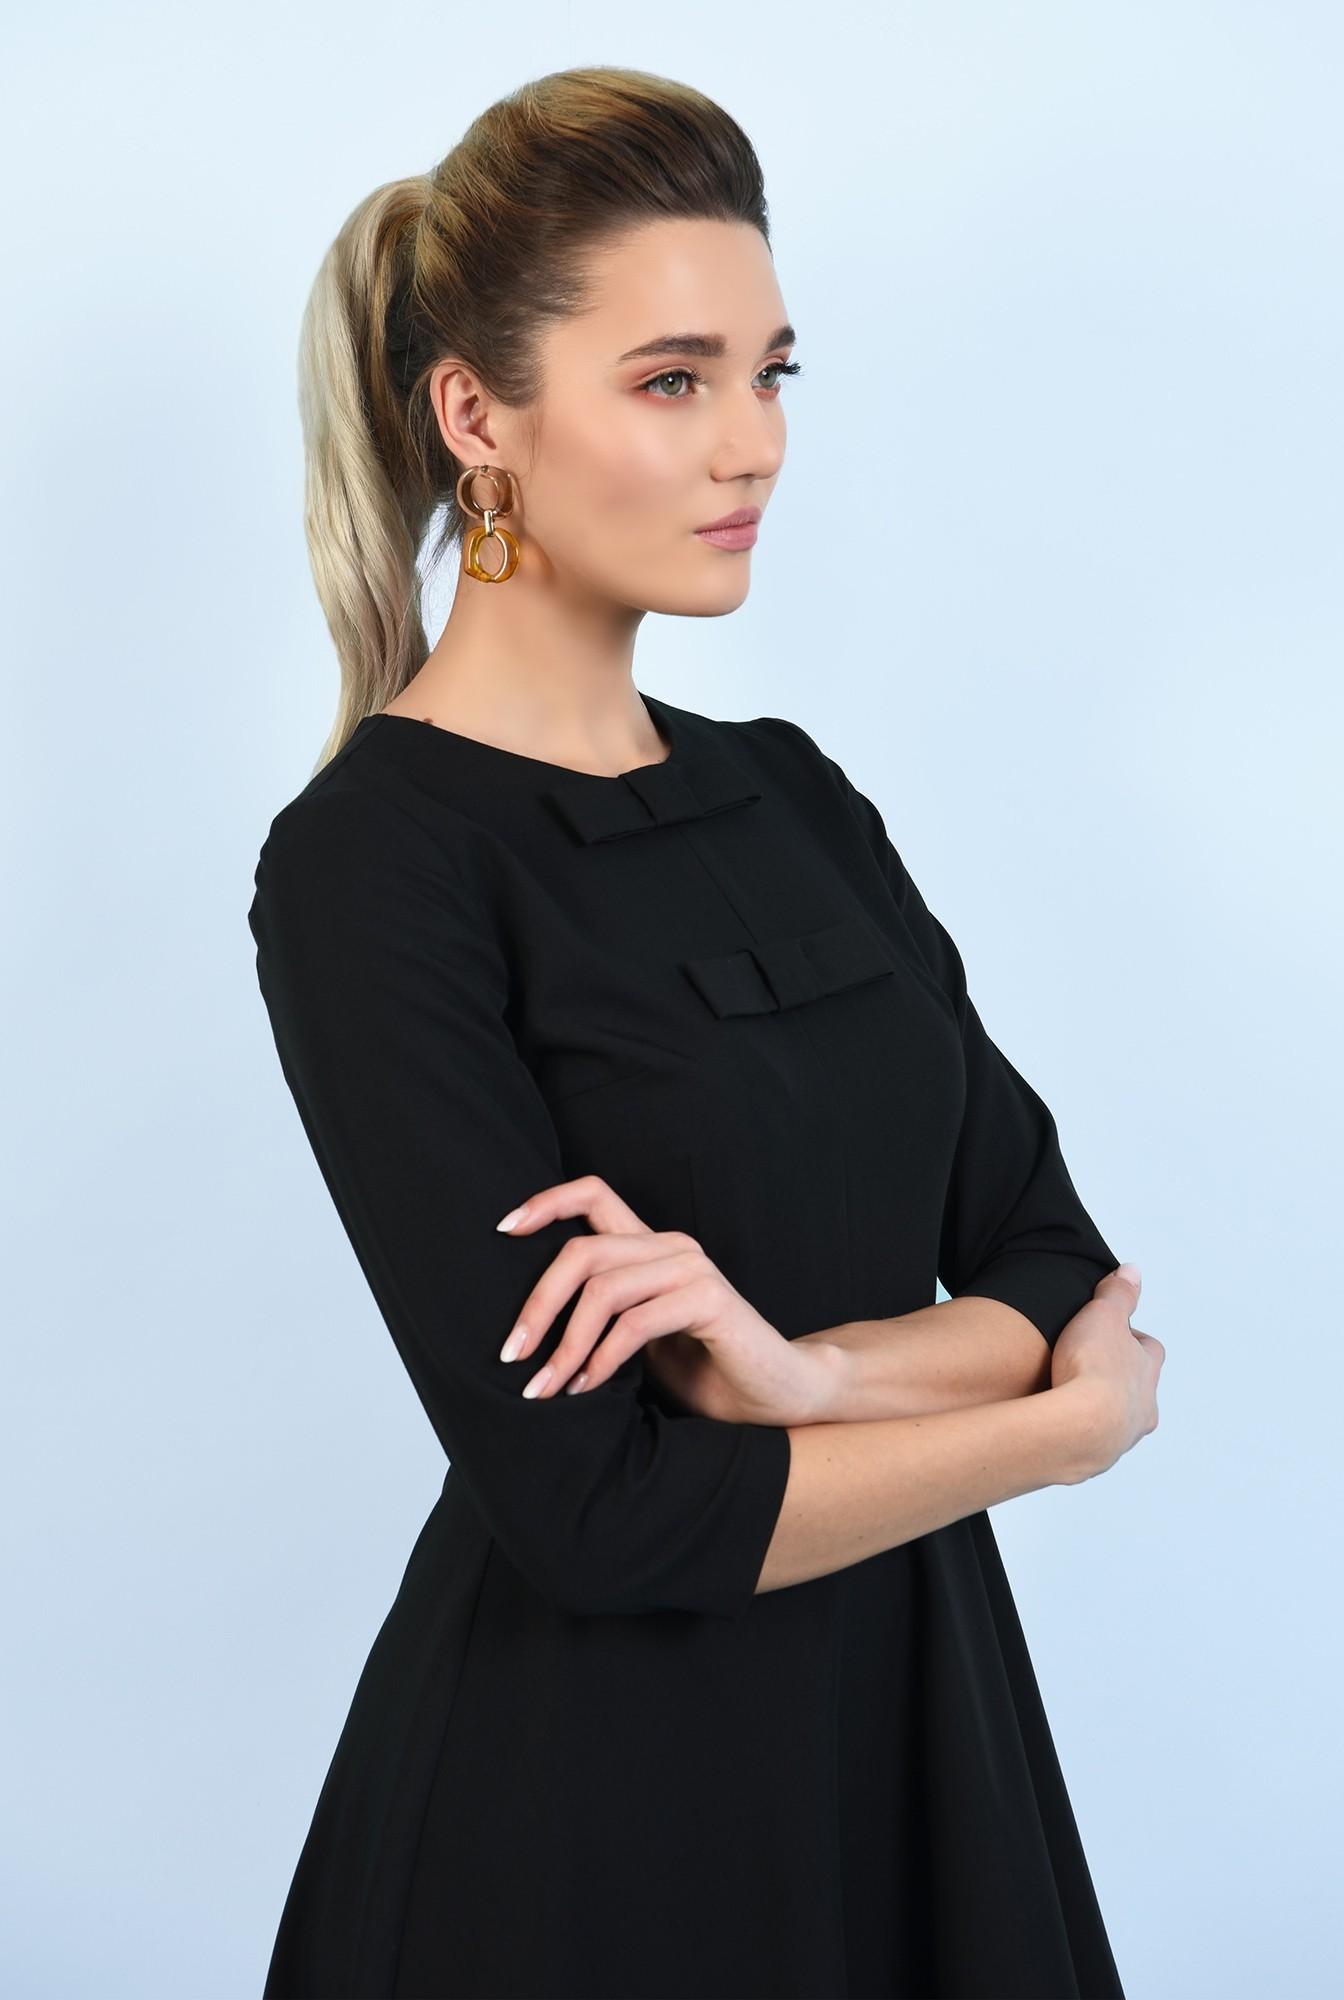 2 - 360 - rochie neagra, evazata, cu funde, rochie office, midi